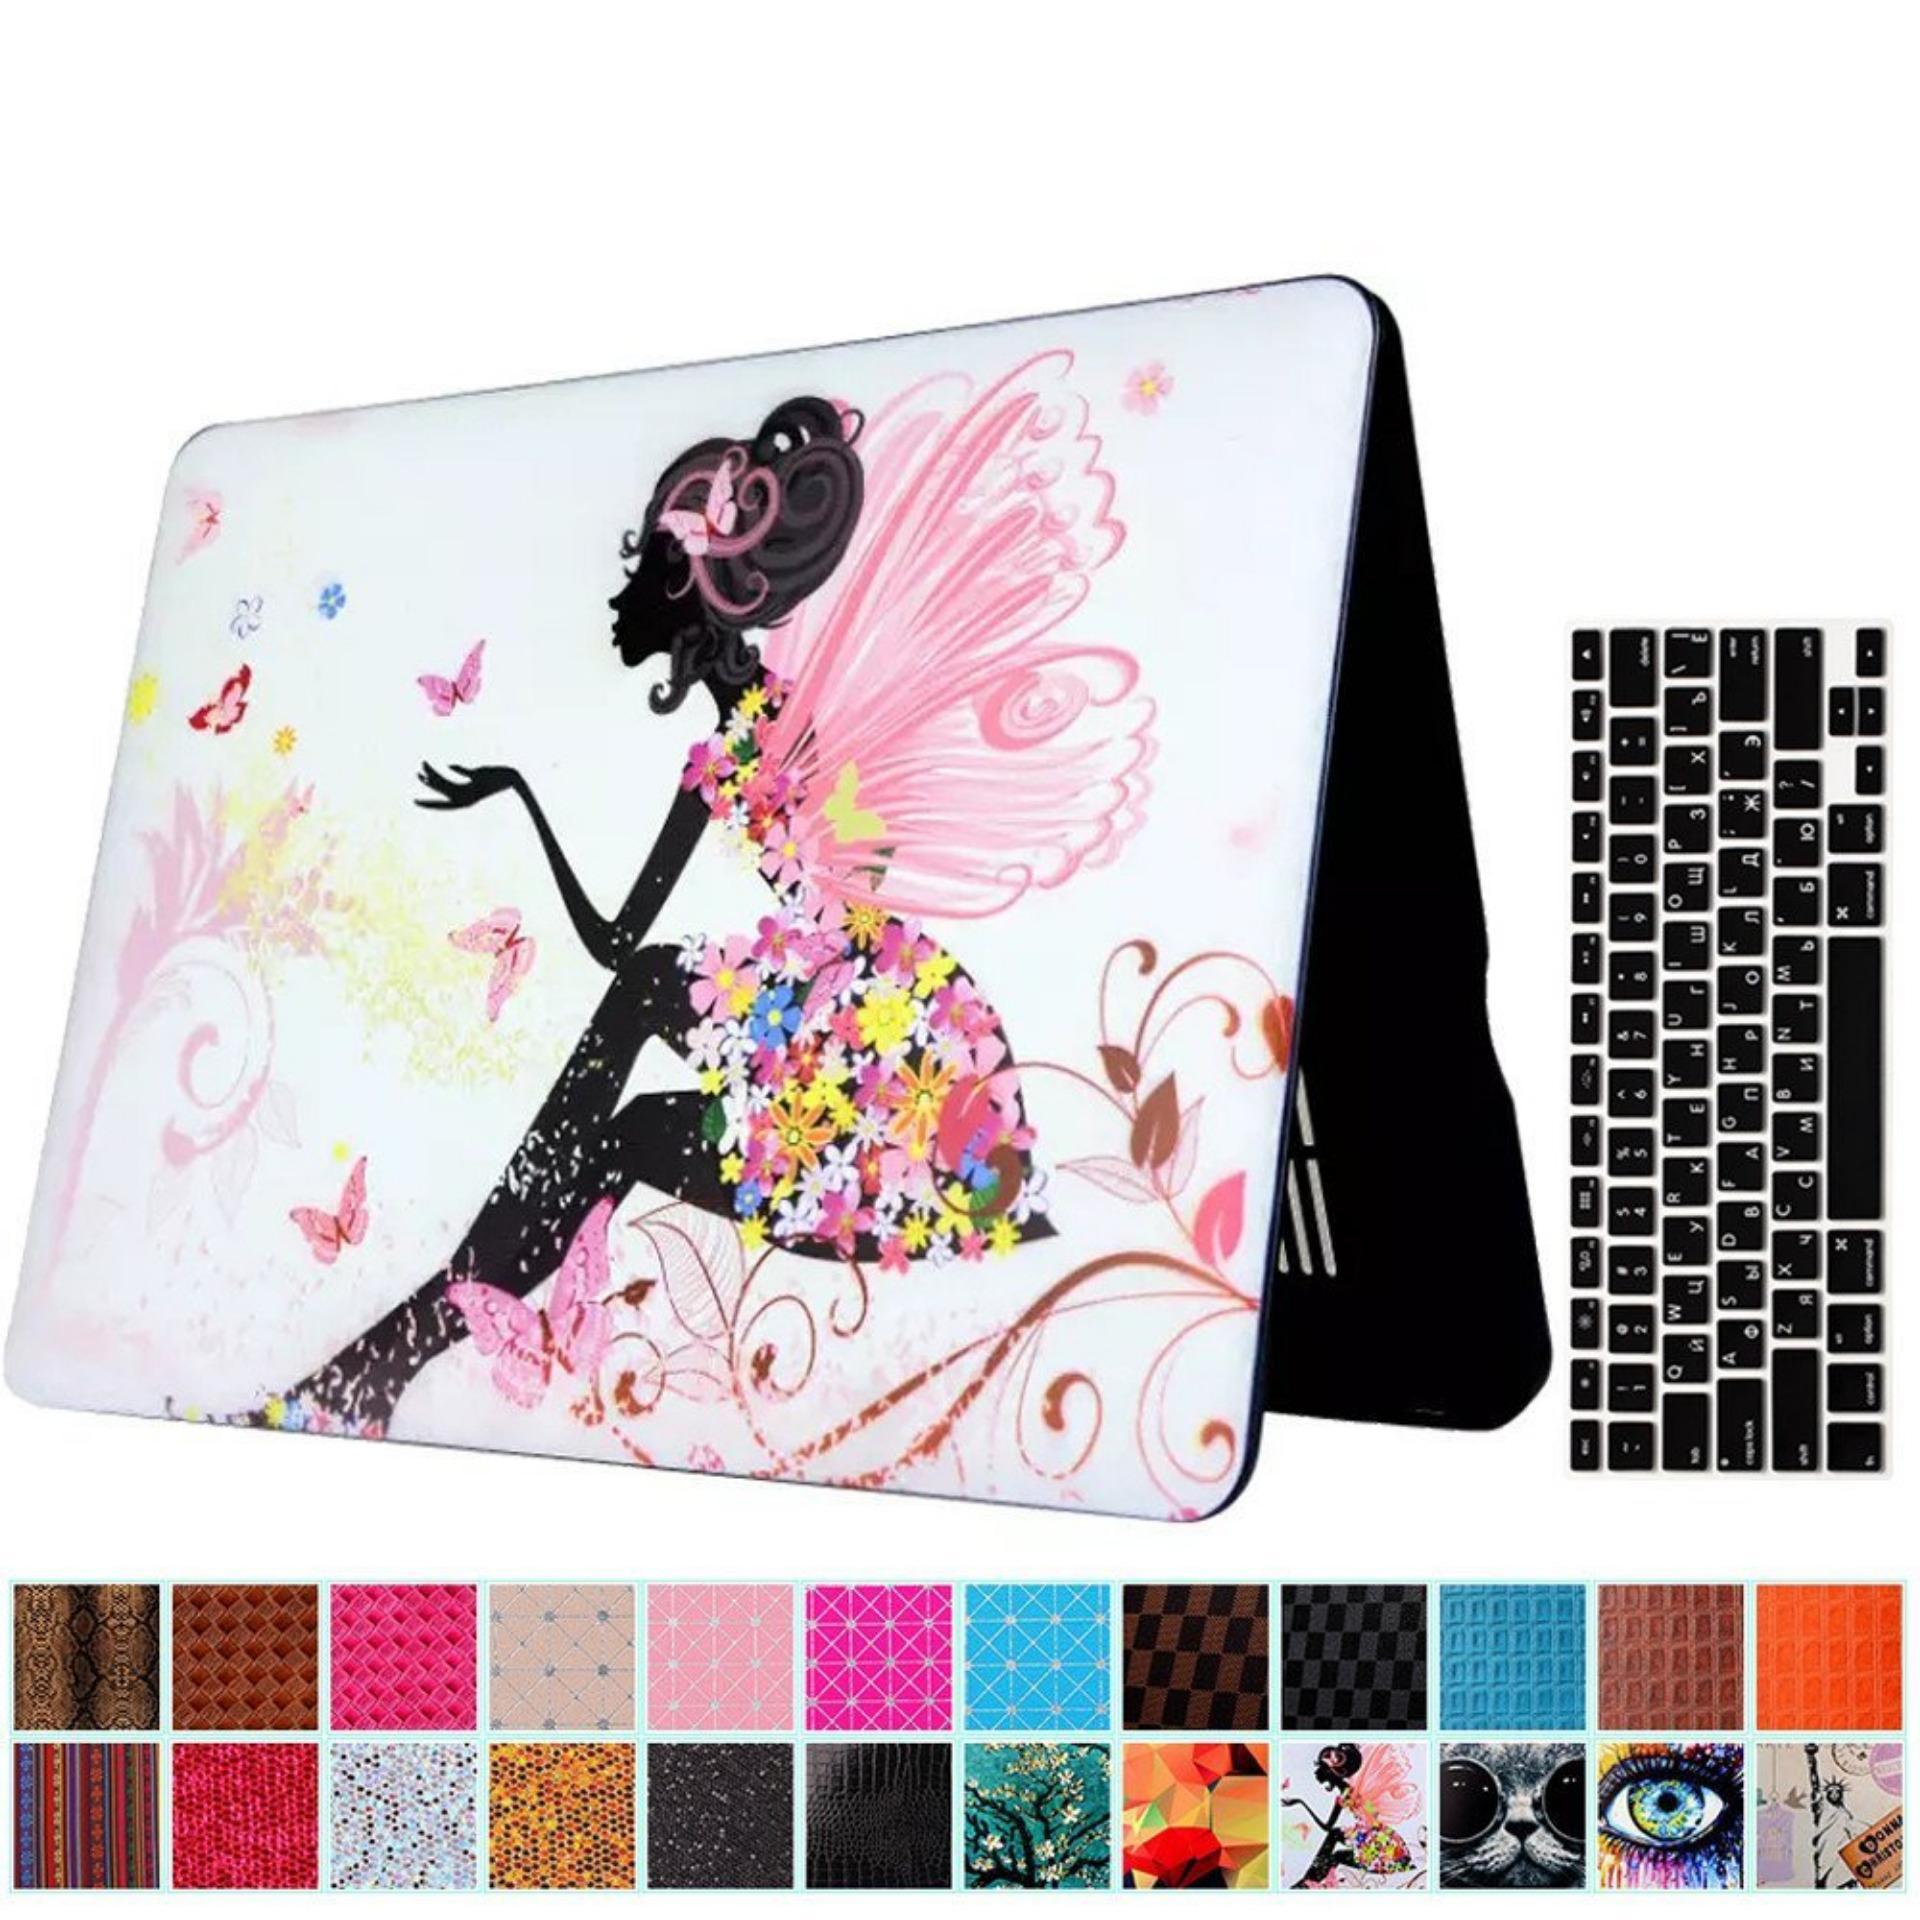 ... Macbook Air 13'' Case and Keyboard Protector, 2 in 1 BeautifulPattern Hard Case ...